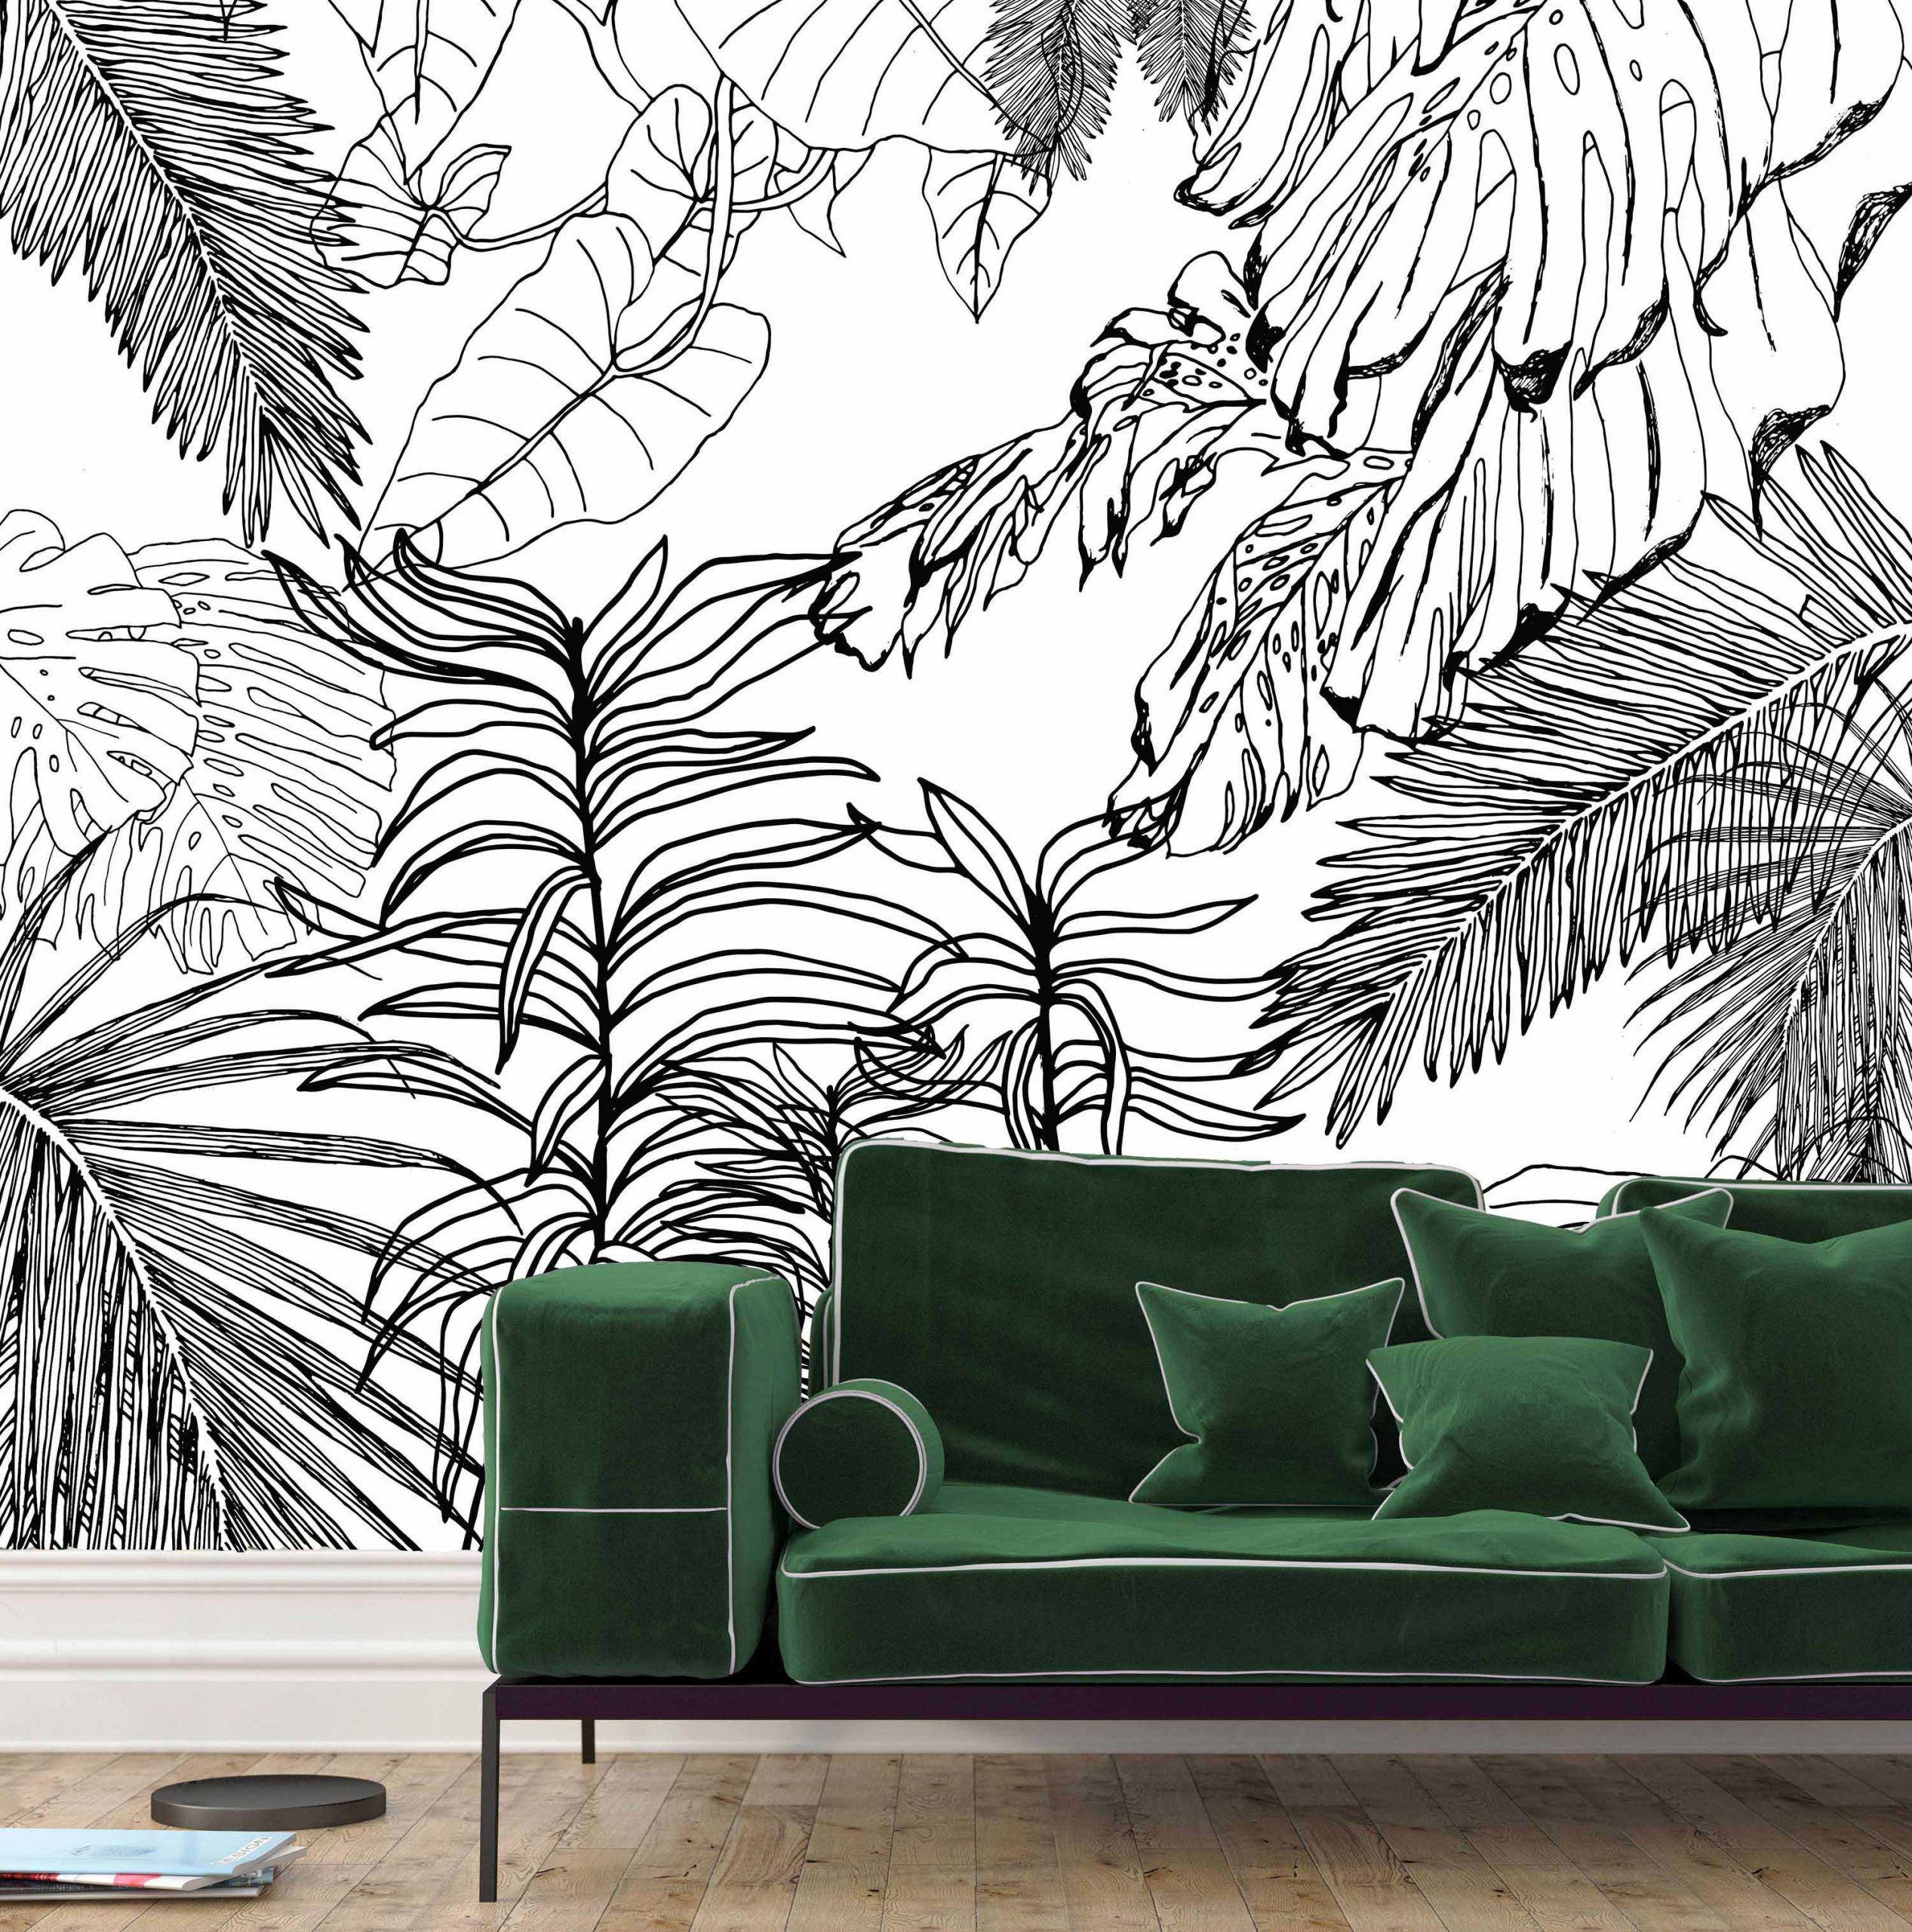 Palm Simplicity flock wall mural